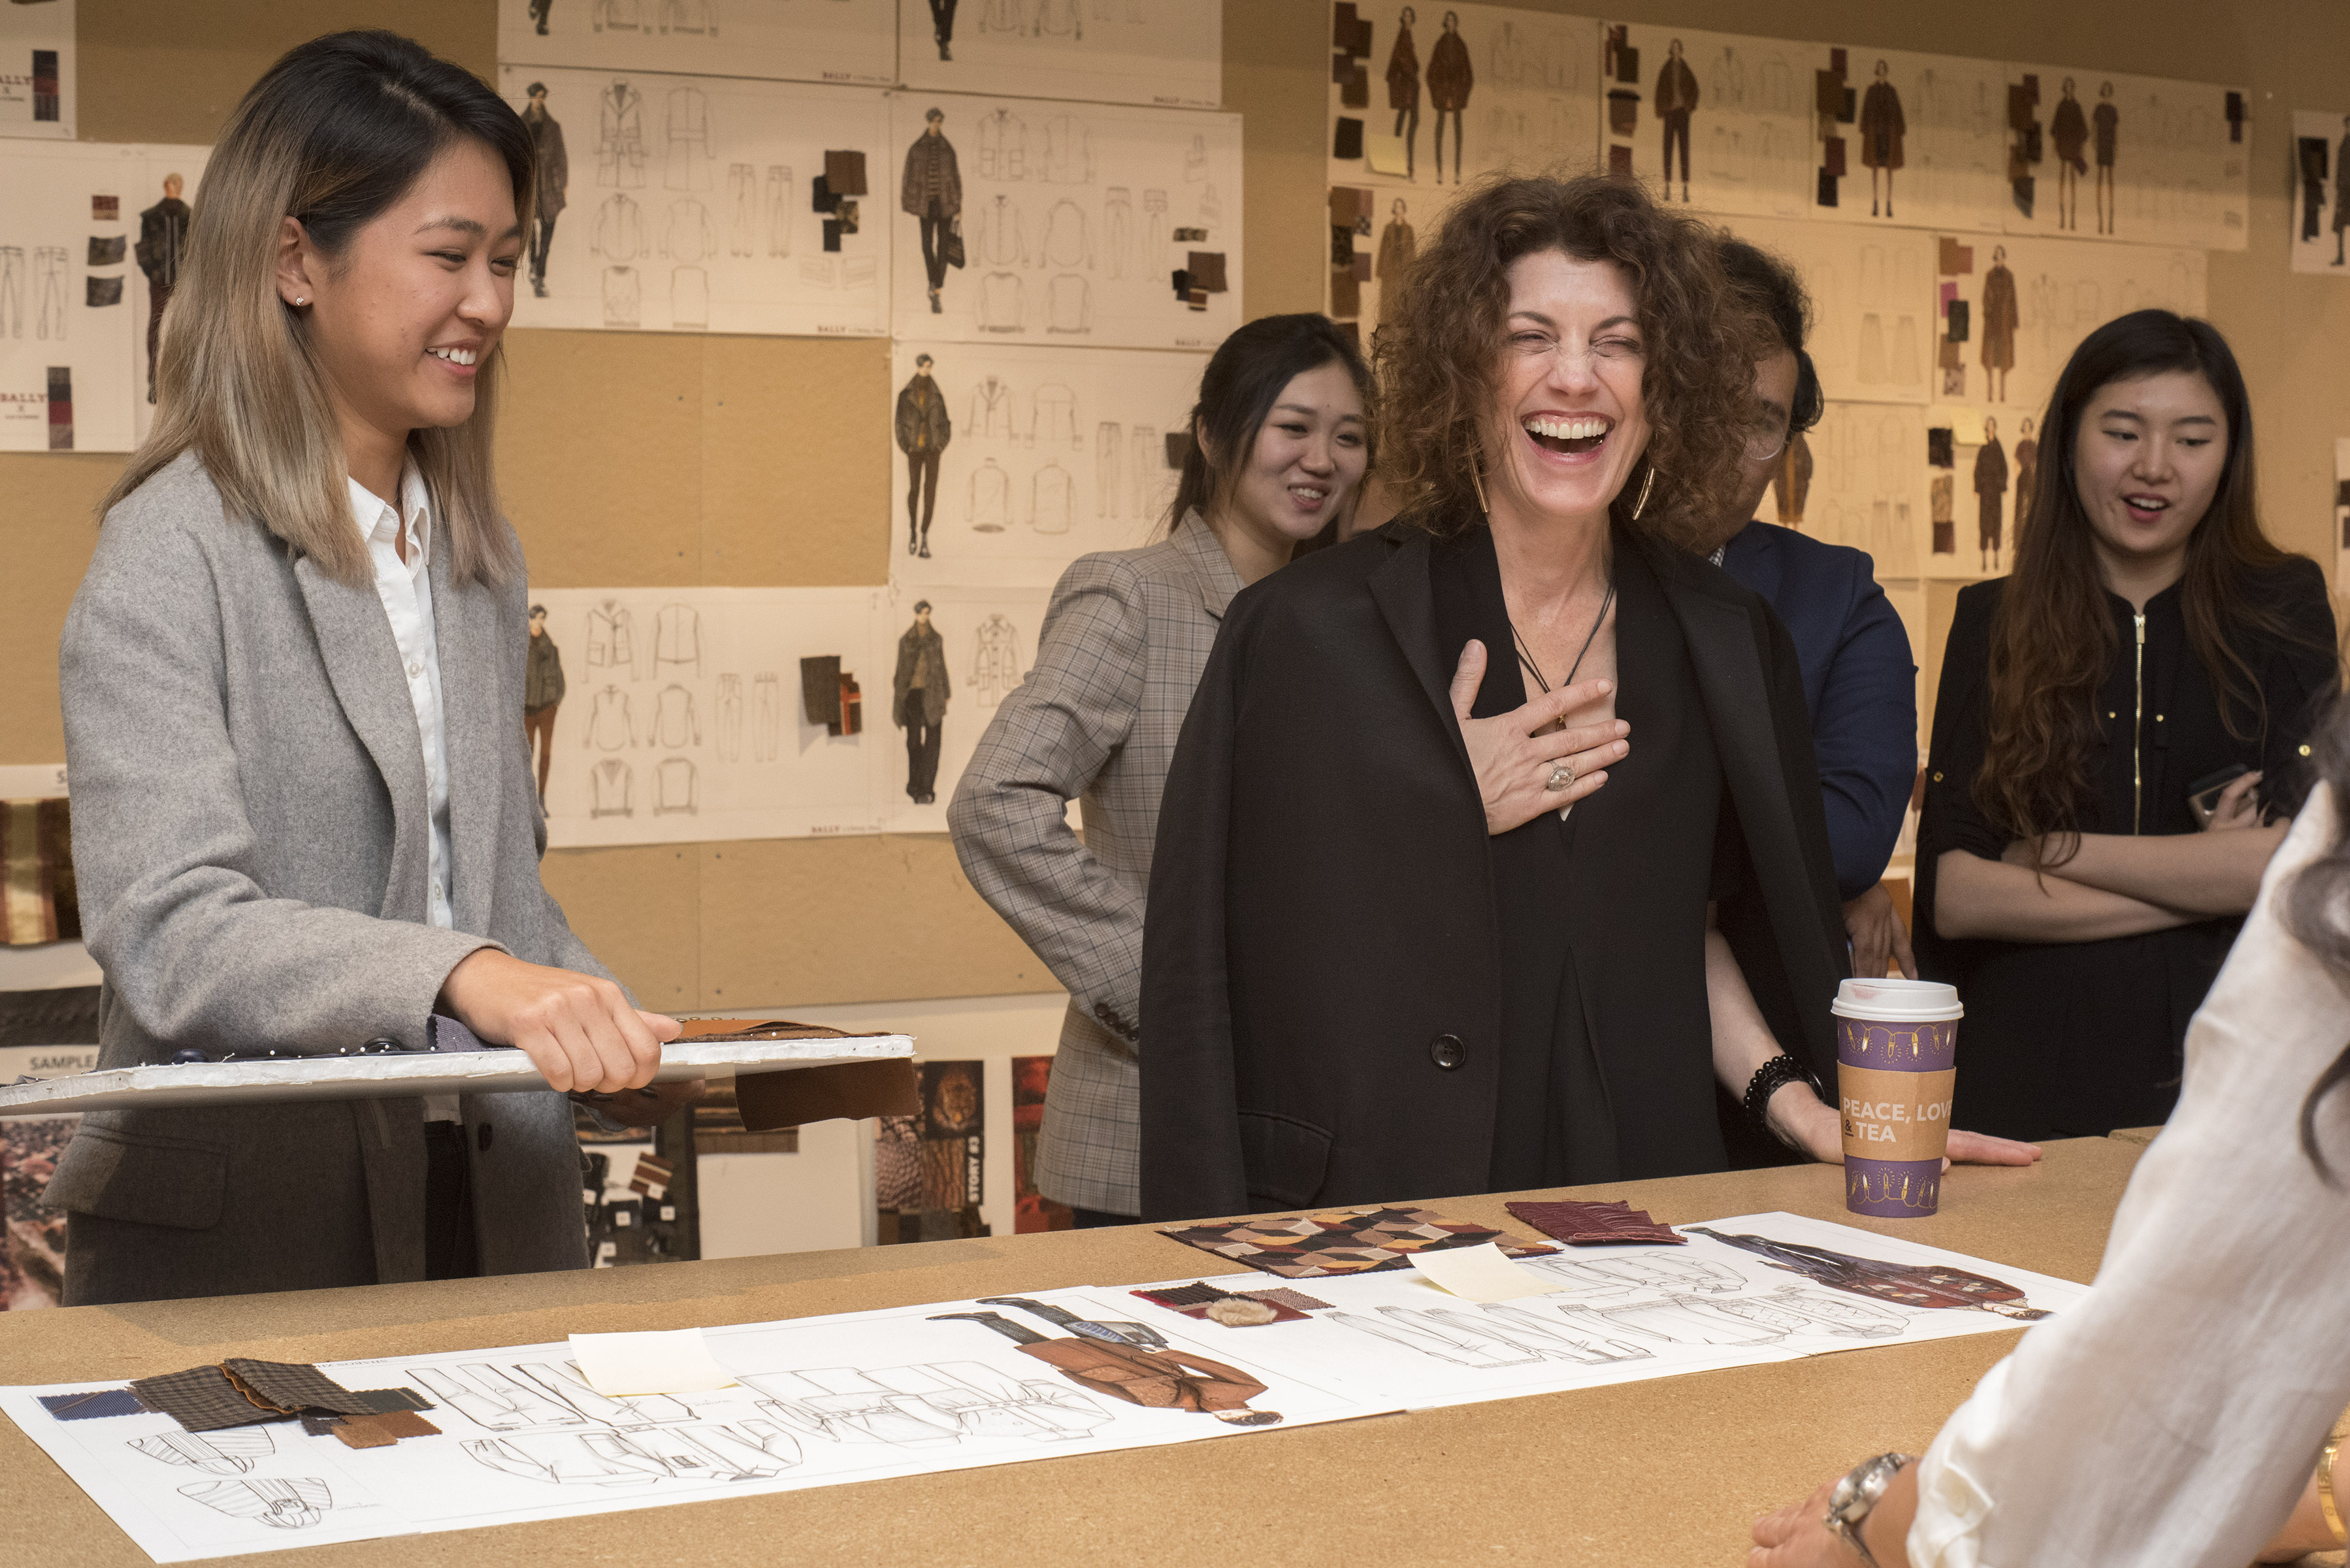 Otis College of Art and Design 2018 Mentorship Program